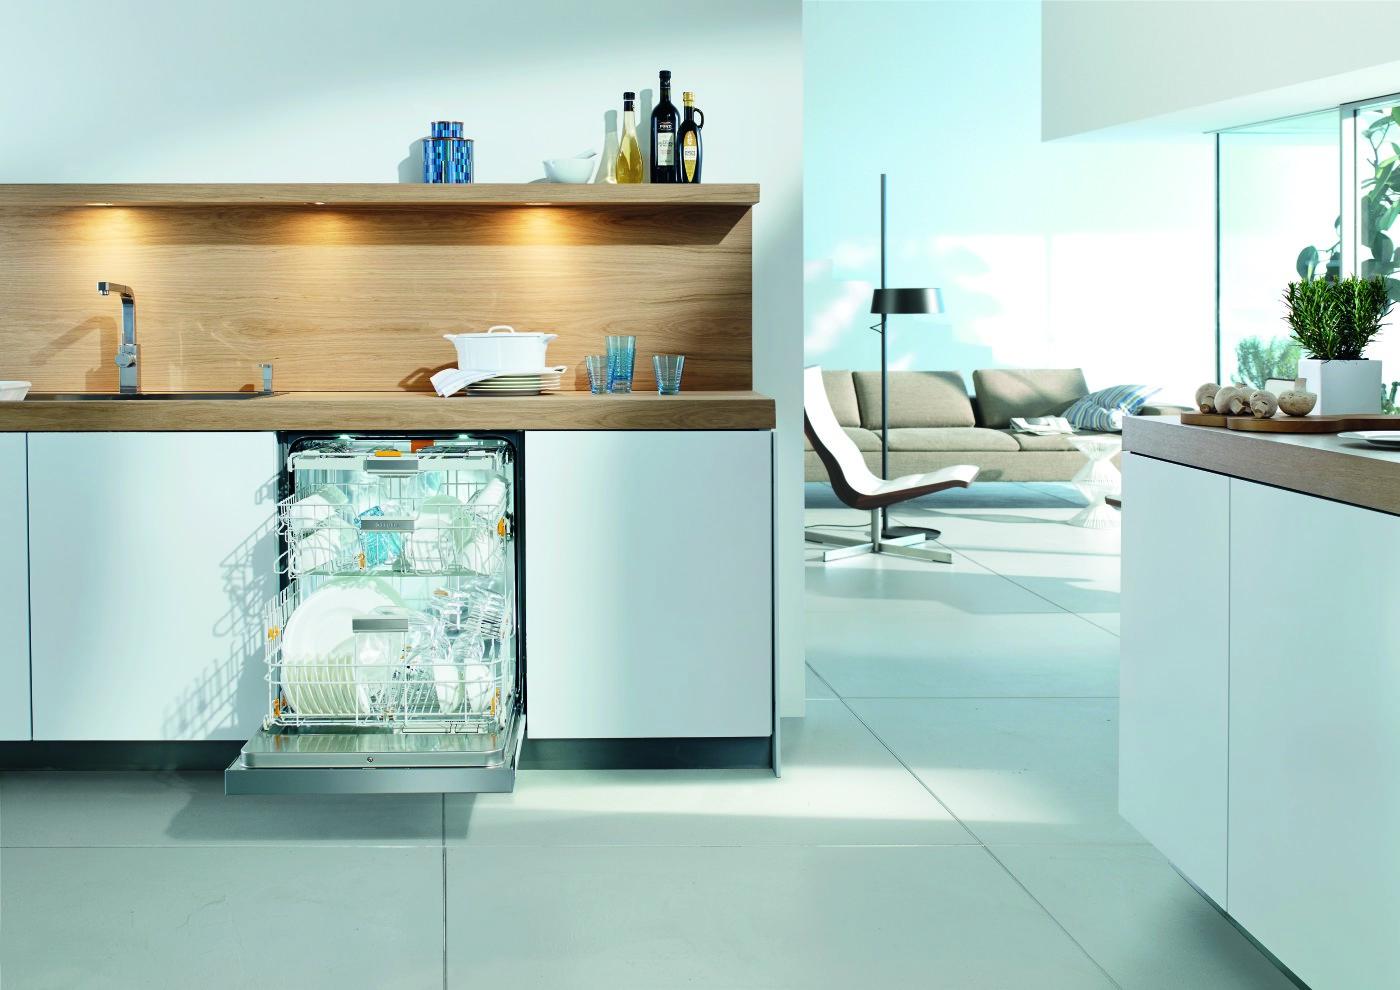 Superbe Miele Dishwashers   MieleG 6505 SCi CLST Lumen Dishwasher